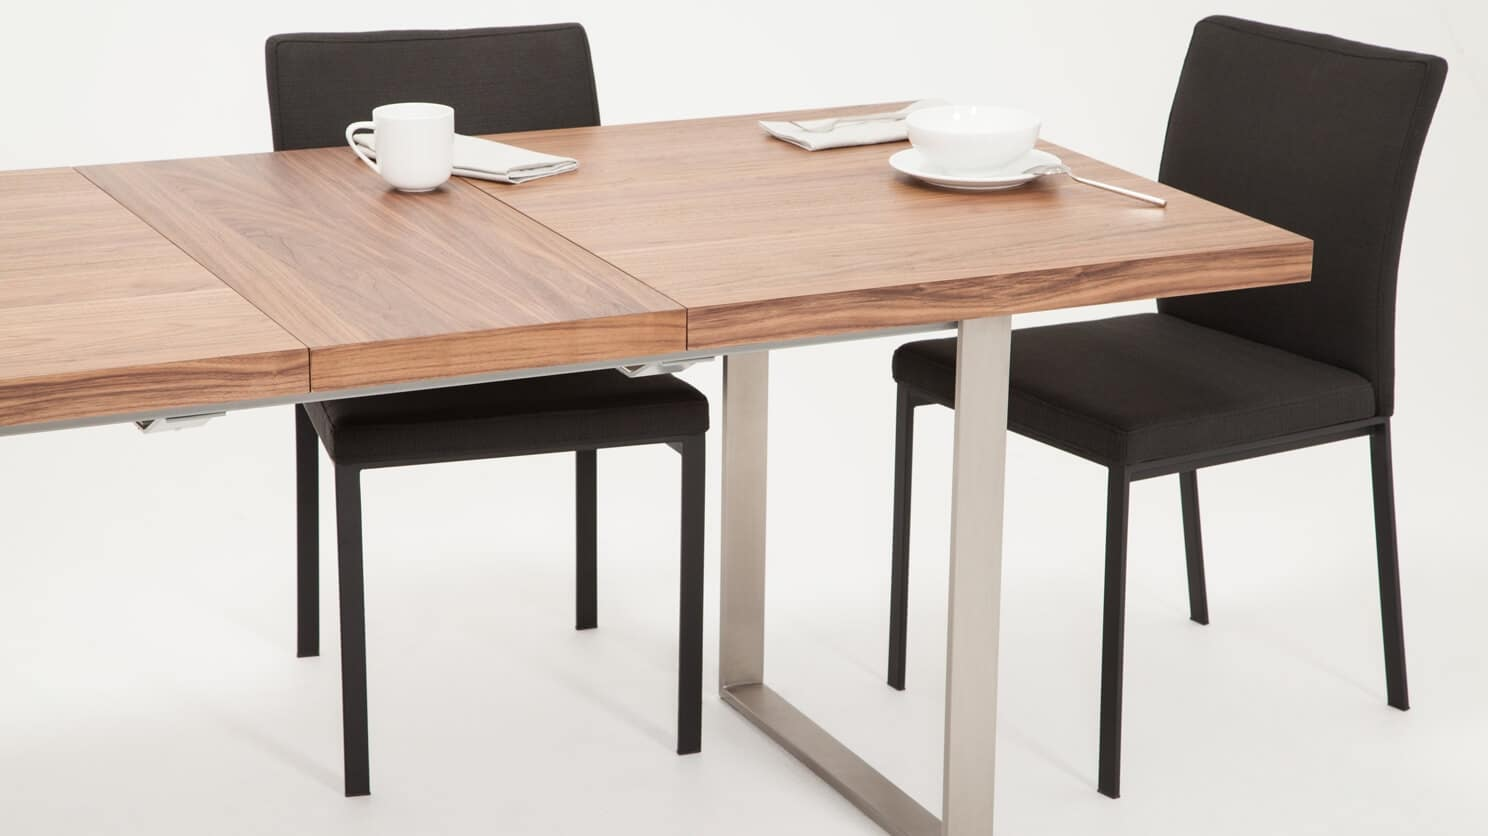 3020 340 par 8 dining tables hatch dining table walnut detail 01